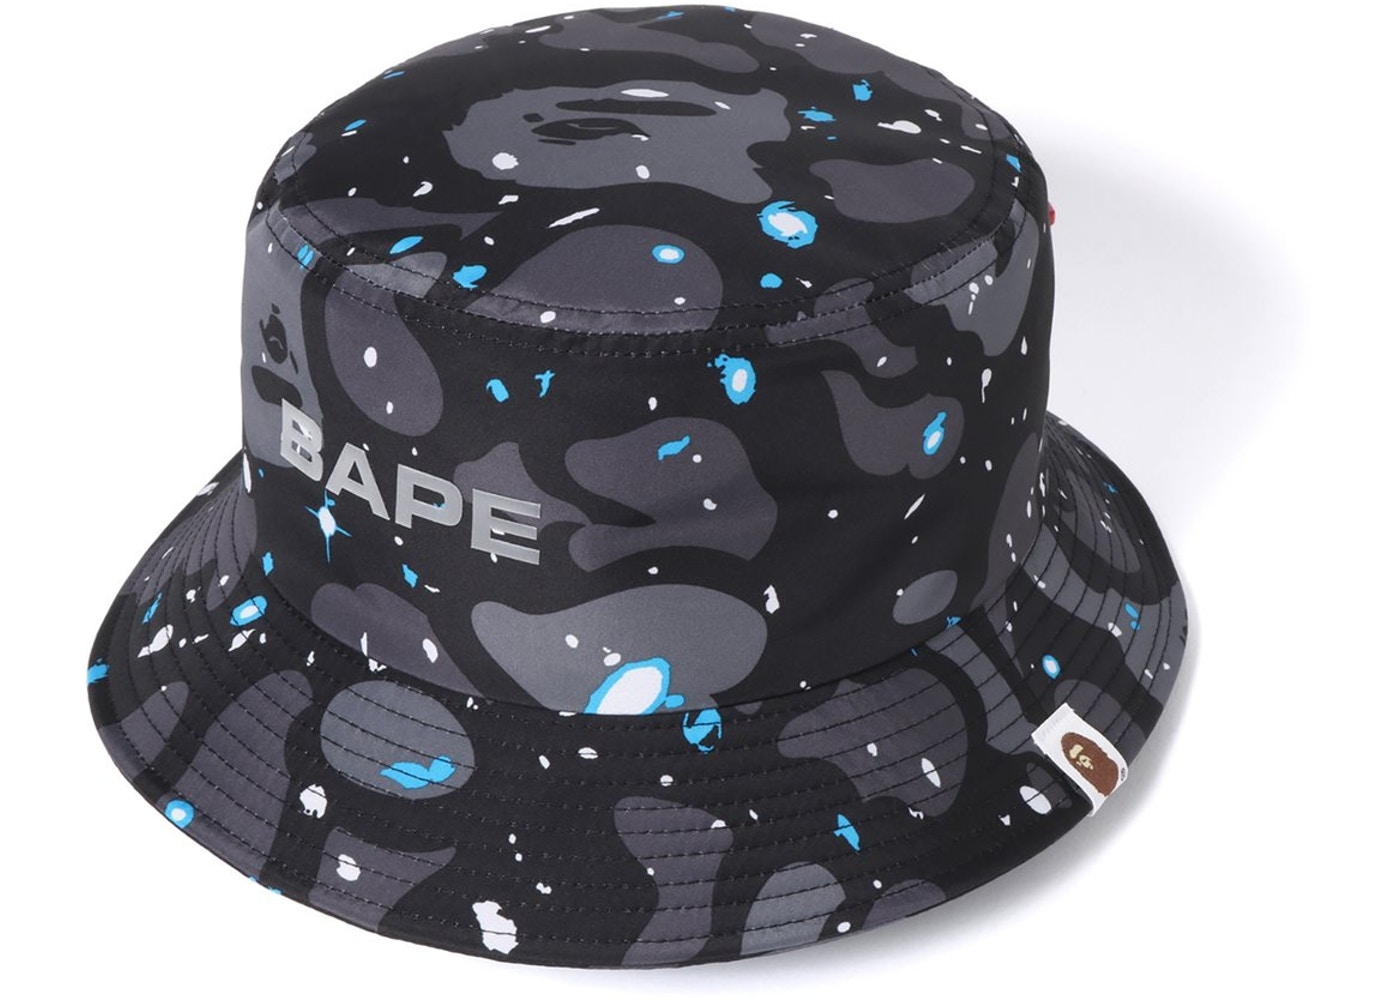 1148e81ab Streetwear - Bape Headwear - Average Sale Price